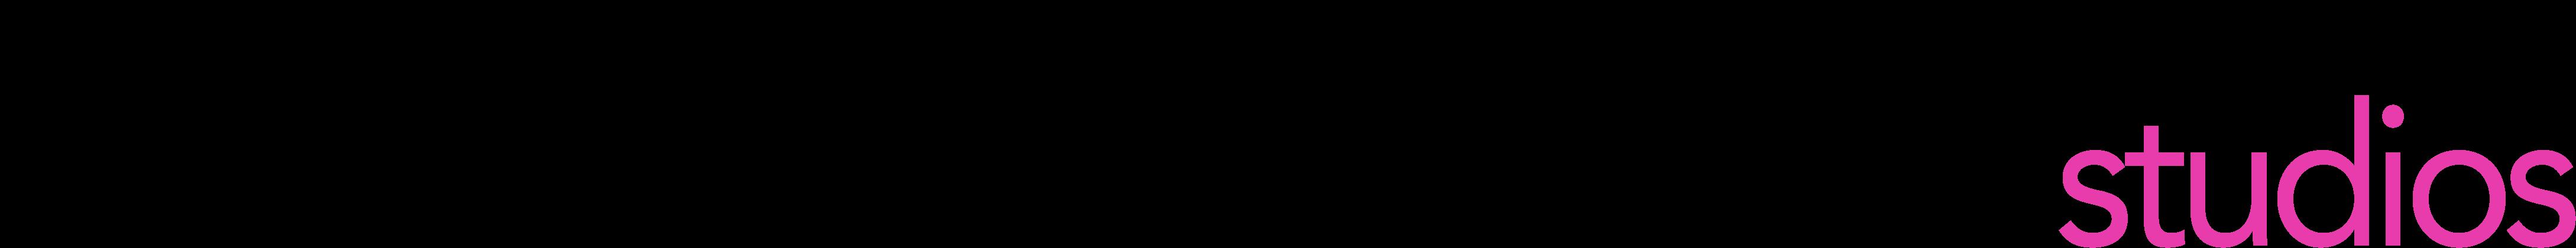 Pink Banana Studios Logo